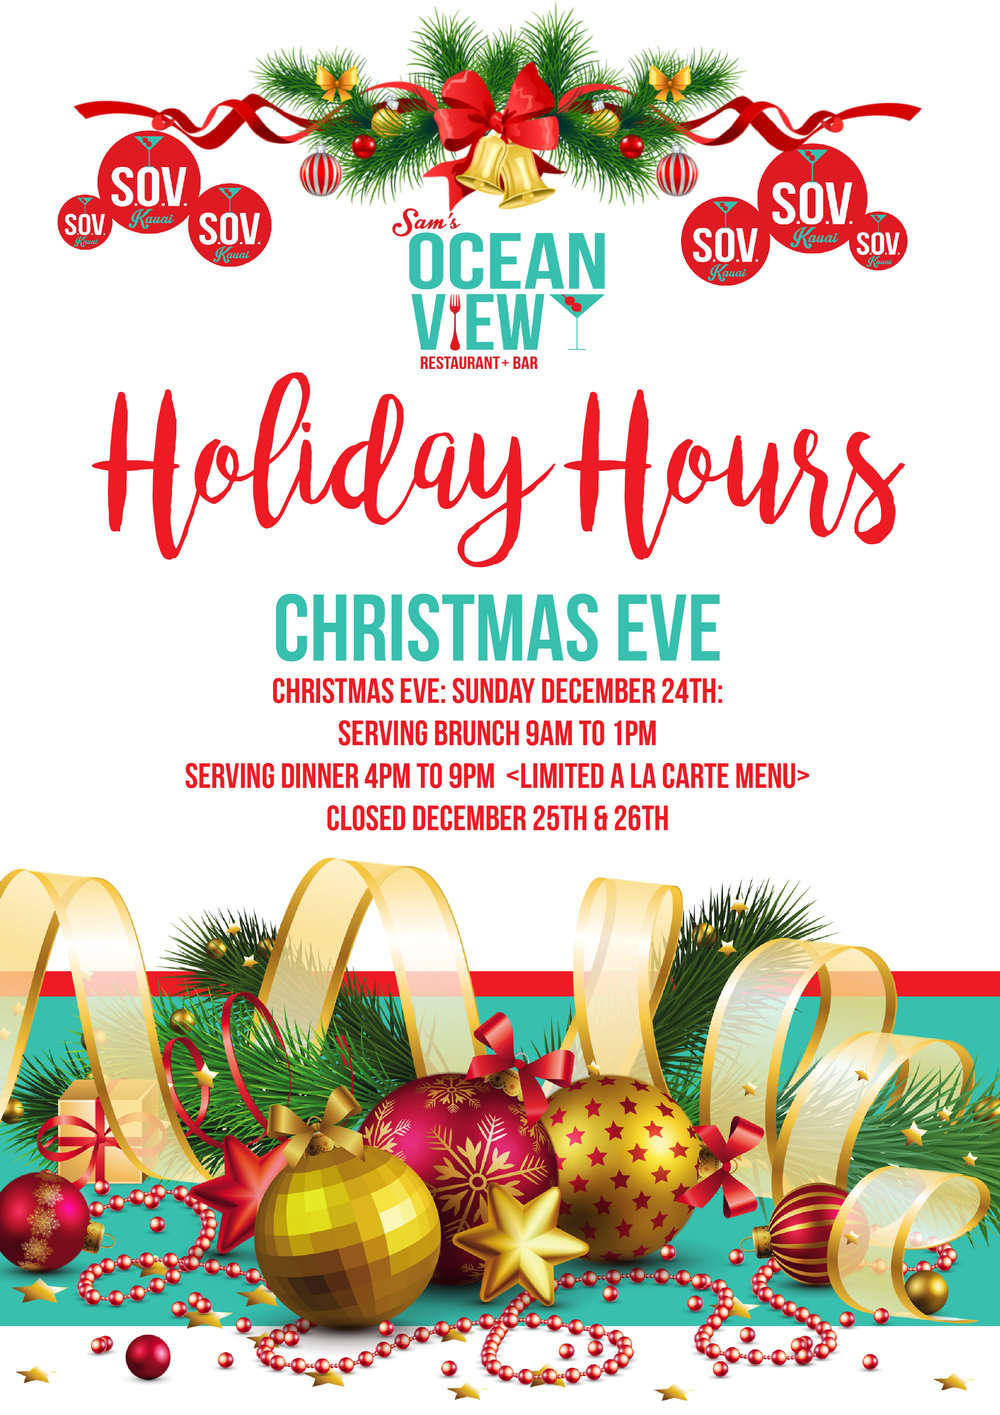 Holiday Hours Website Flyer Christmas Eve.jpg